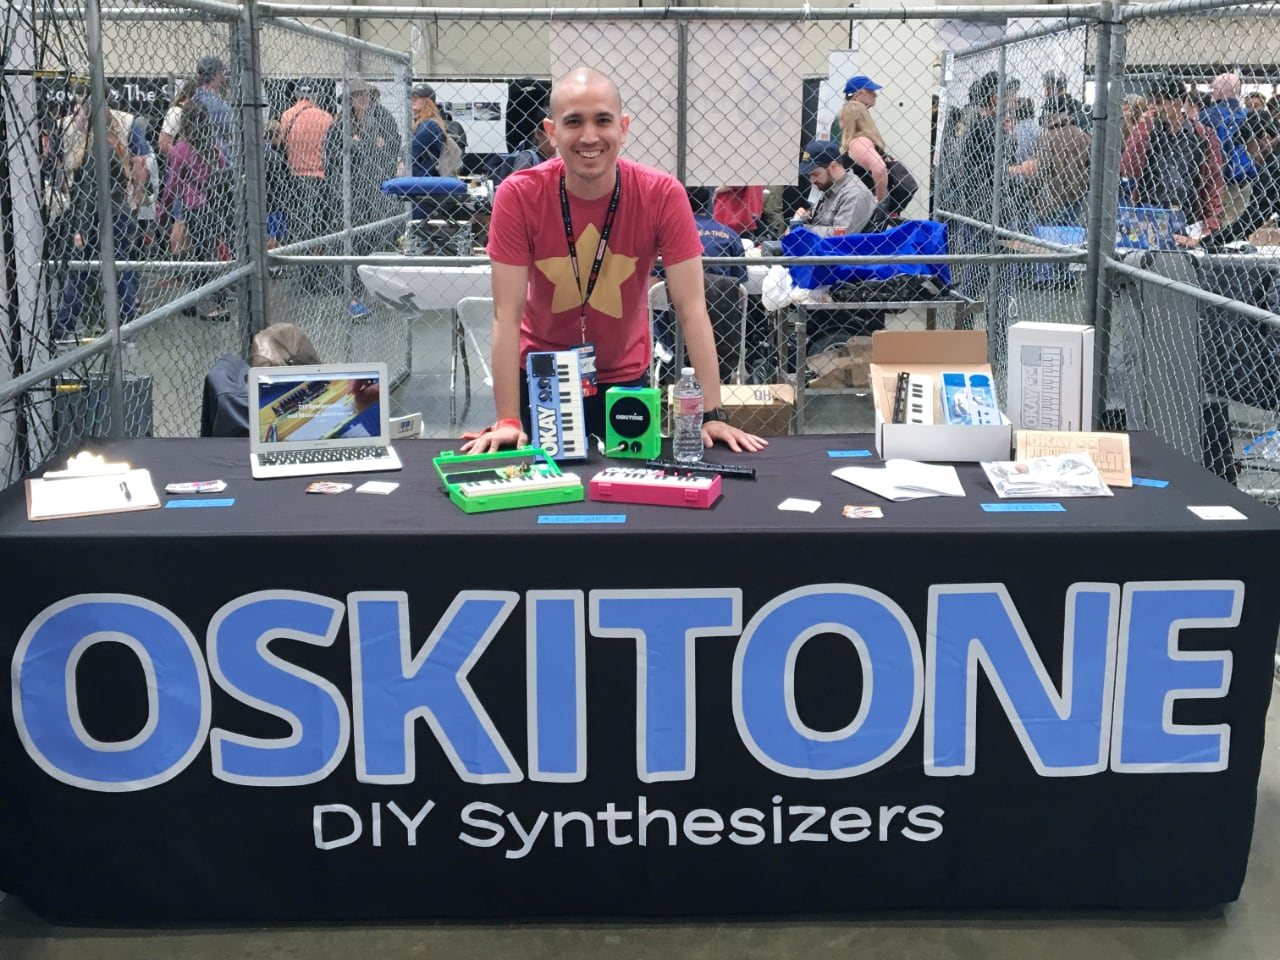 Oskitone at Maker Faire